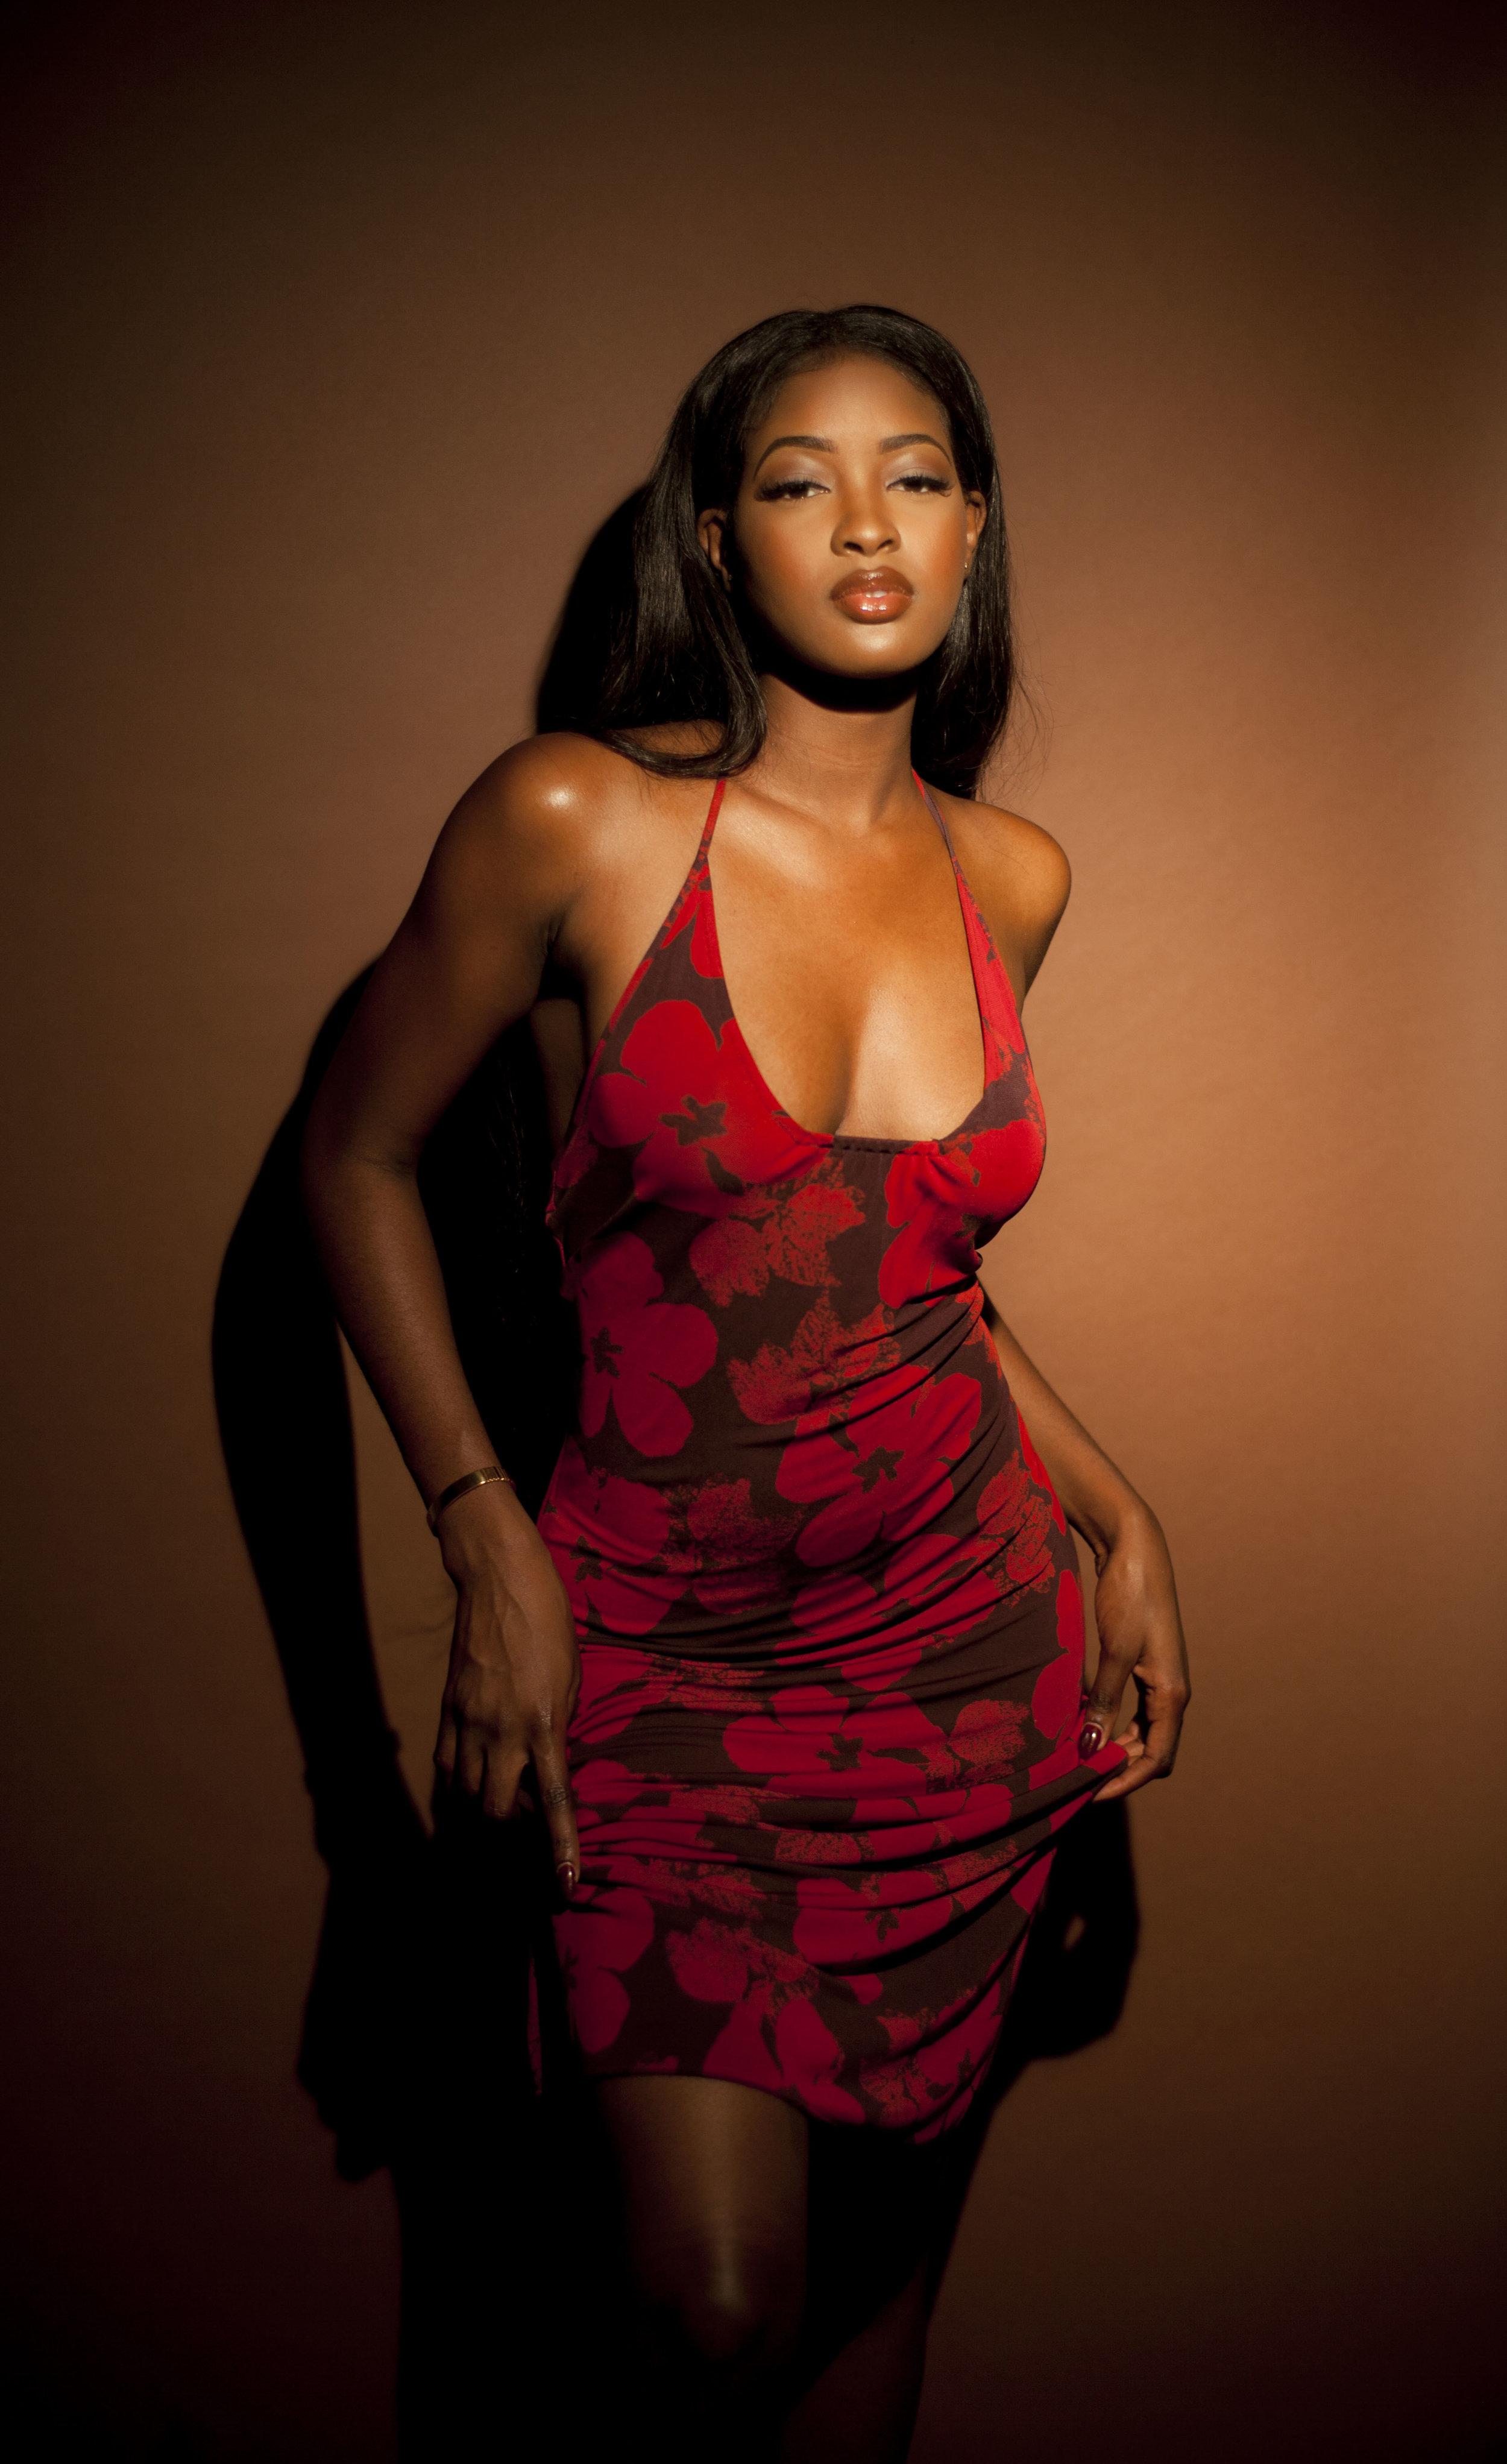 Photo    Andre Gray     Model    Sira Kante     Styled by   Magdaline Davis